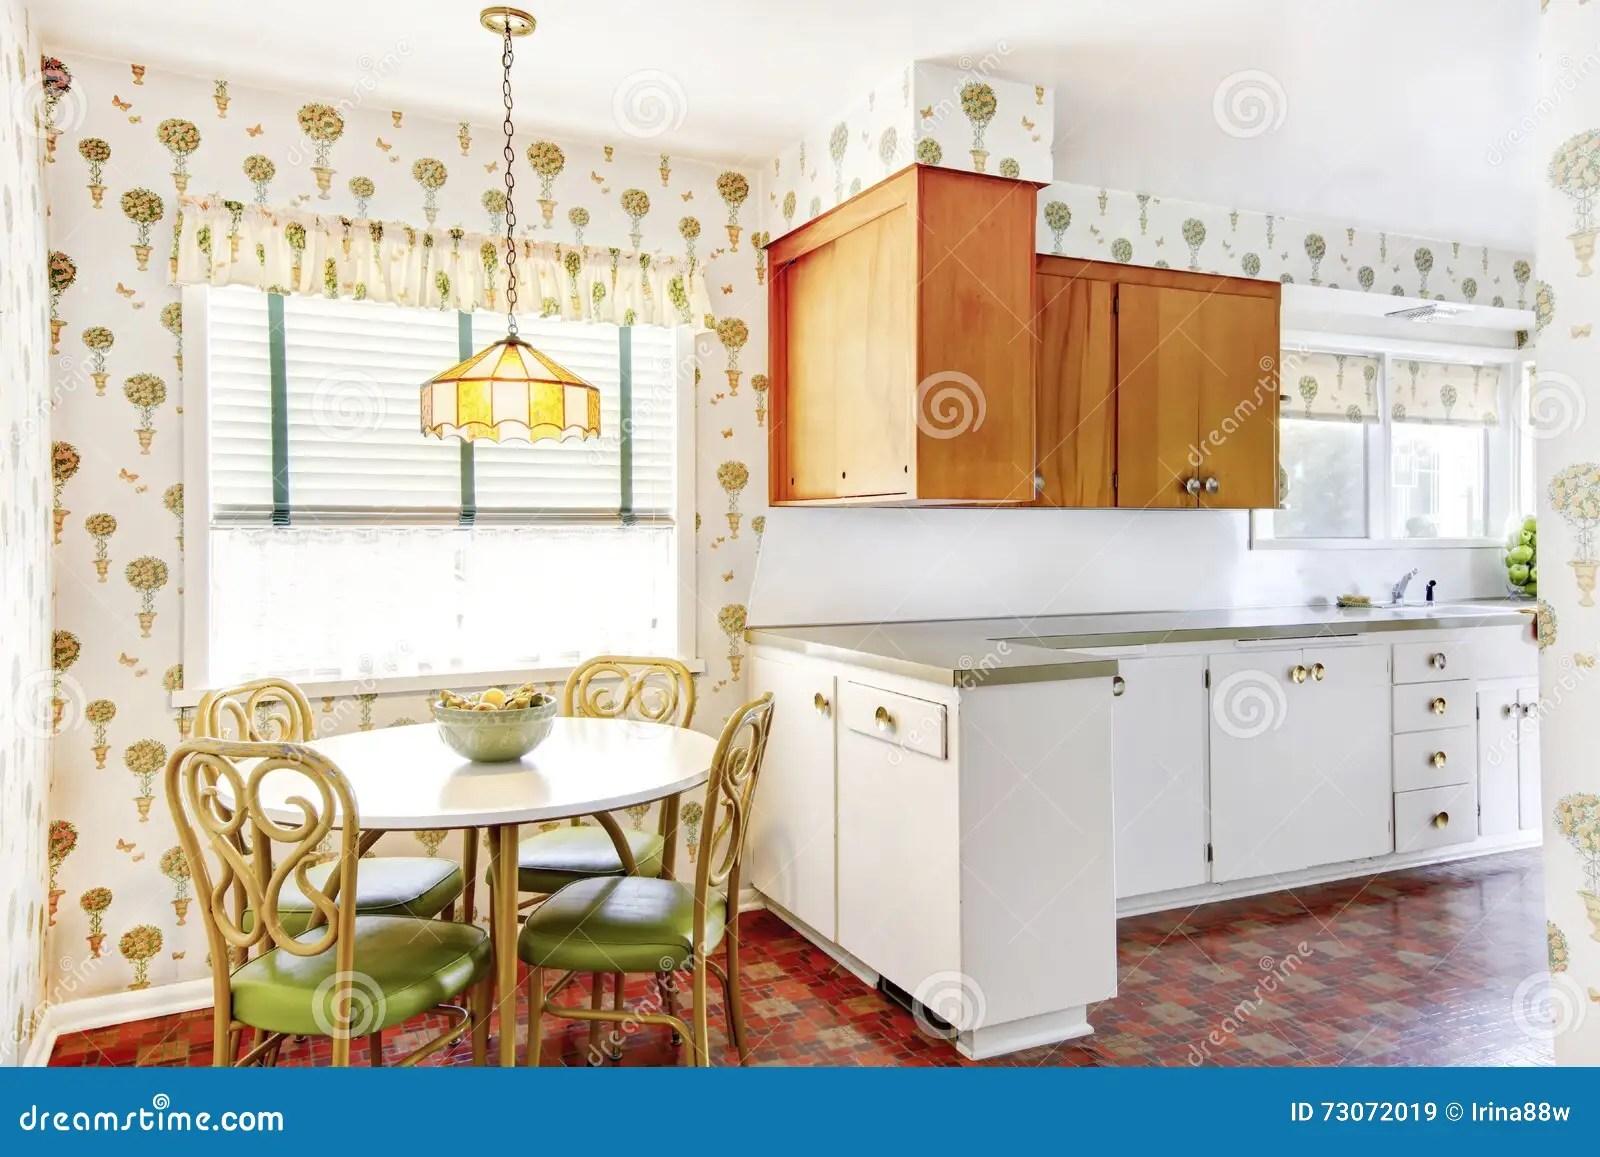 kitchen desk chair multi pendant lighting 与桌椅子集合的饭厅连接用厨房室库存图片 图片包括有庄园 绿色 最高 与桌椅子设置了和墙纸的饭厅和厨房室有关